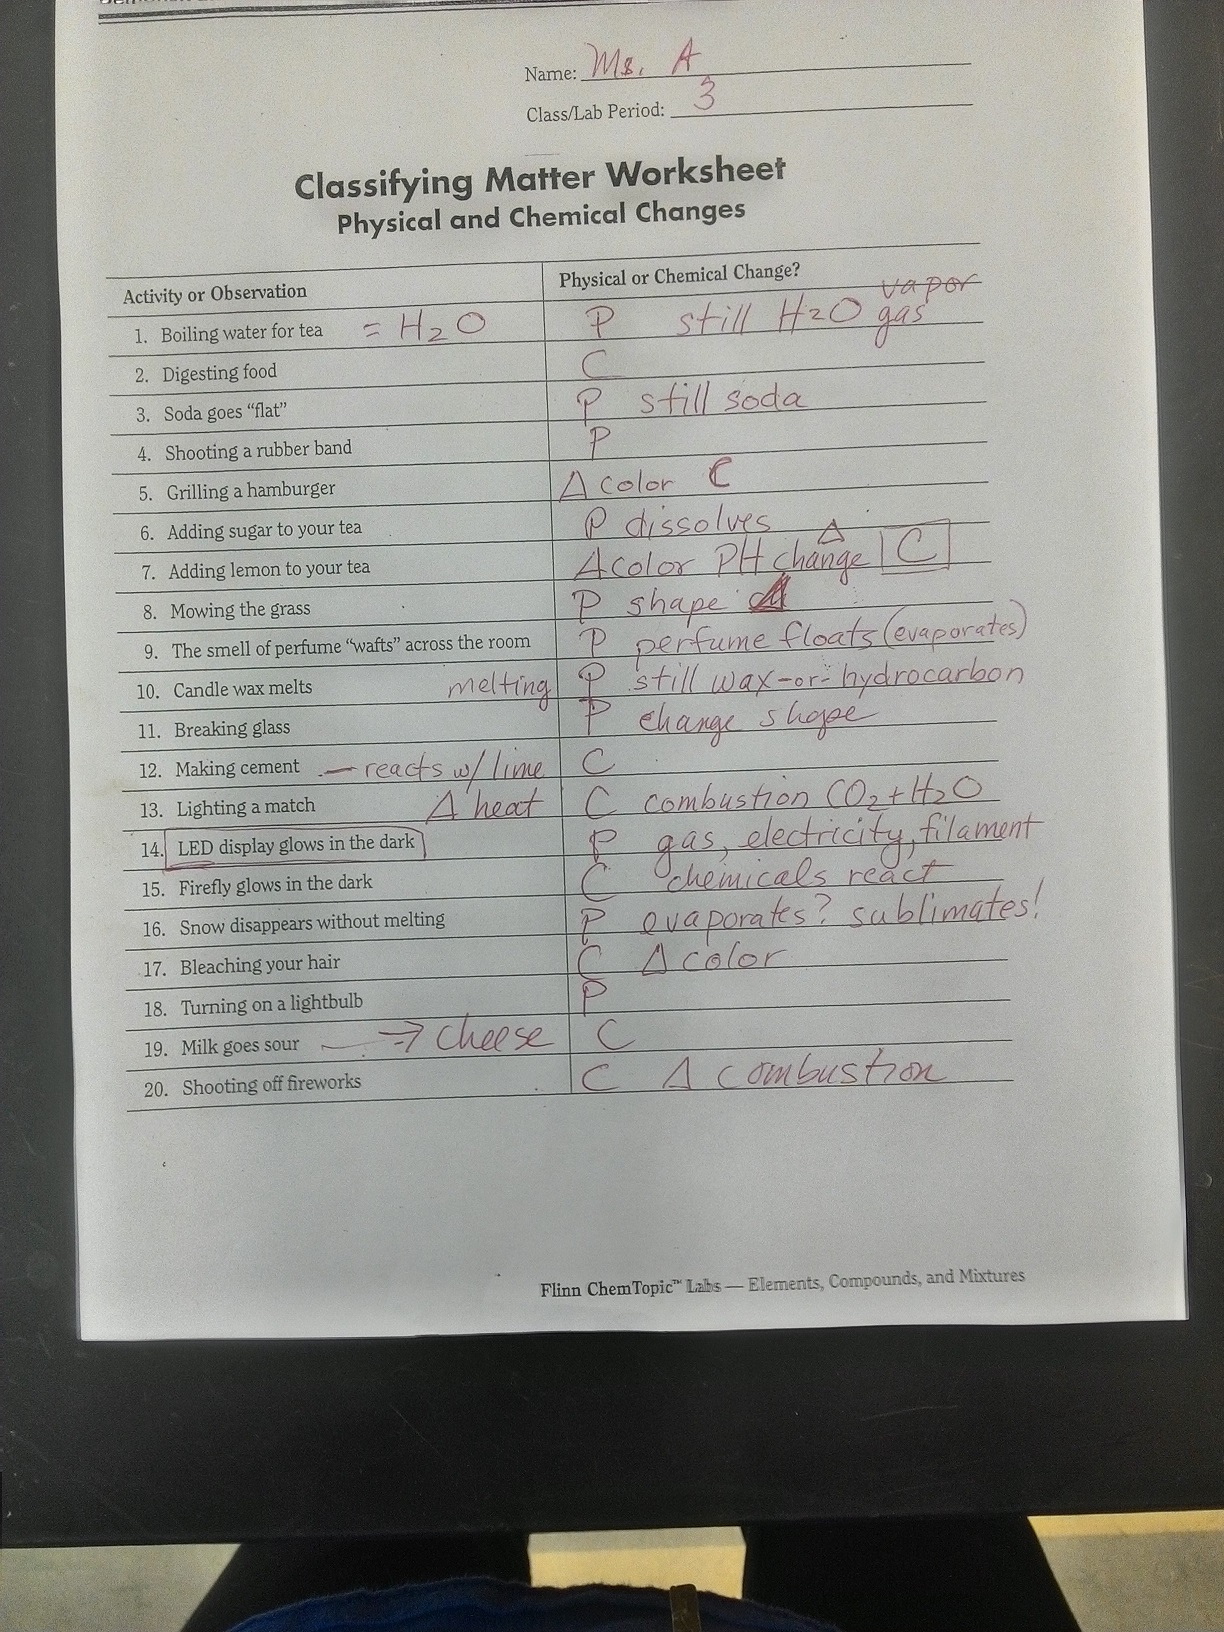 Classifying Matter Worksheet